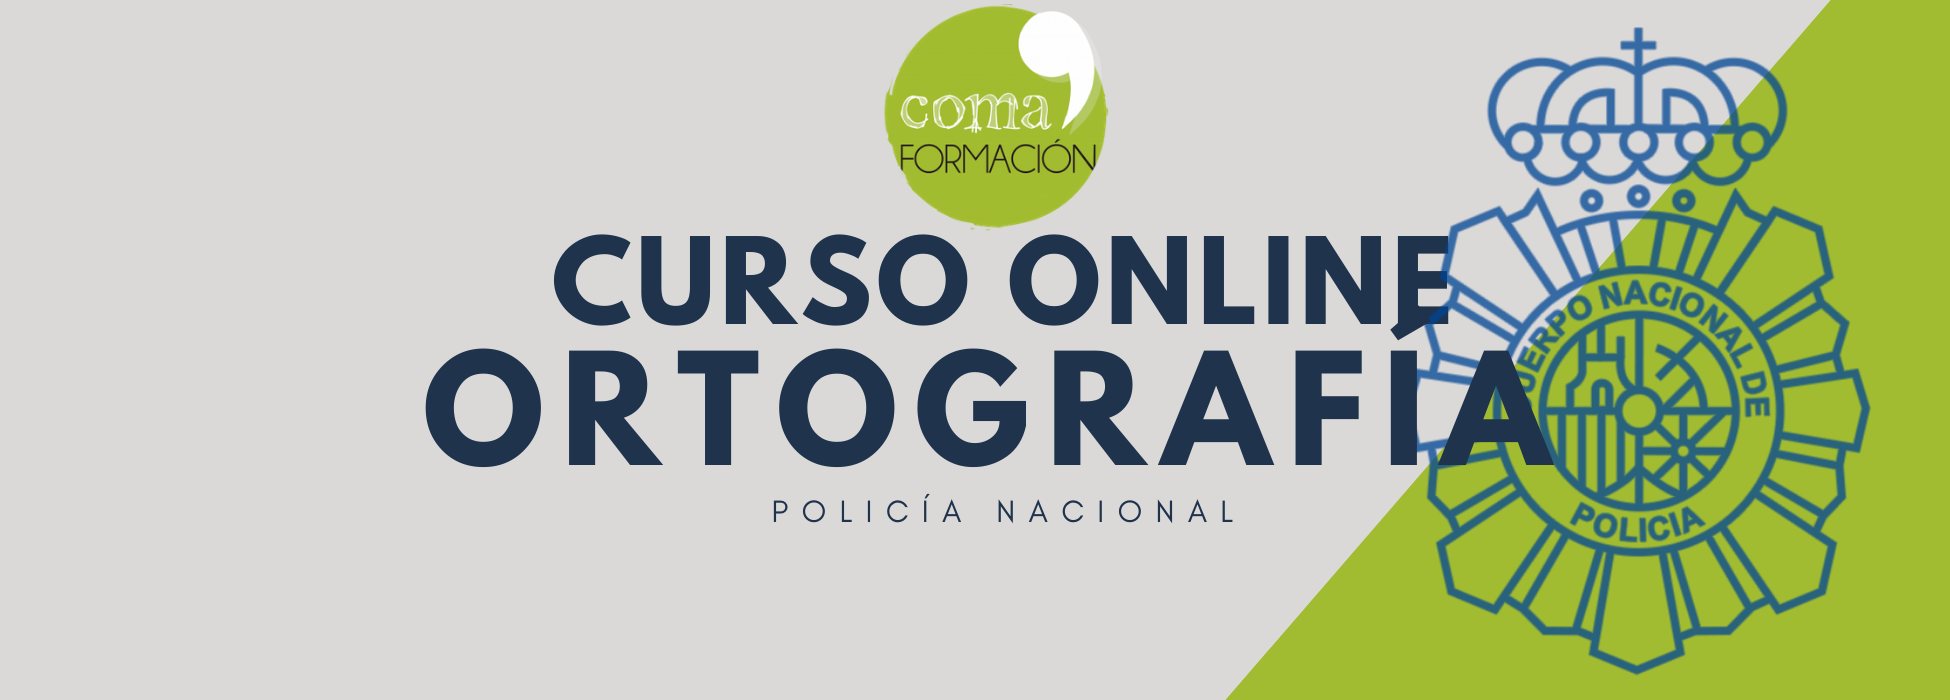 curso-intensivo-online-ortografia-policia-nacional